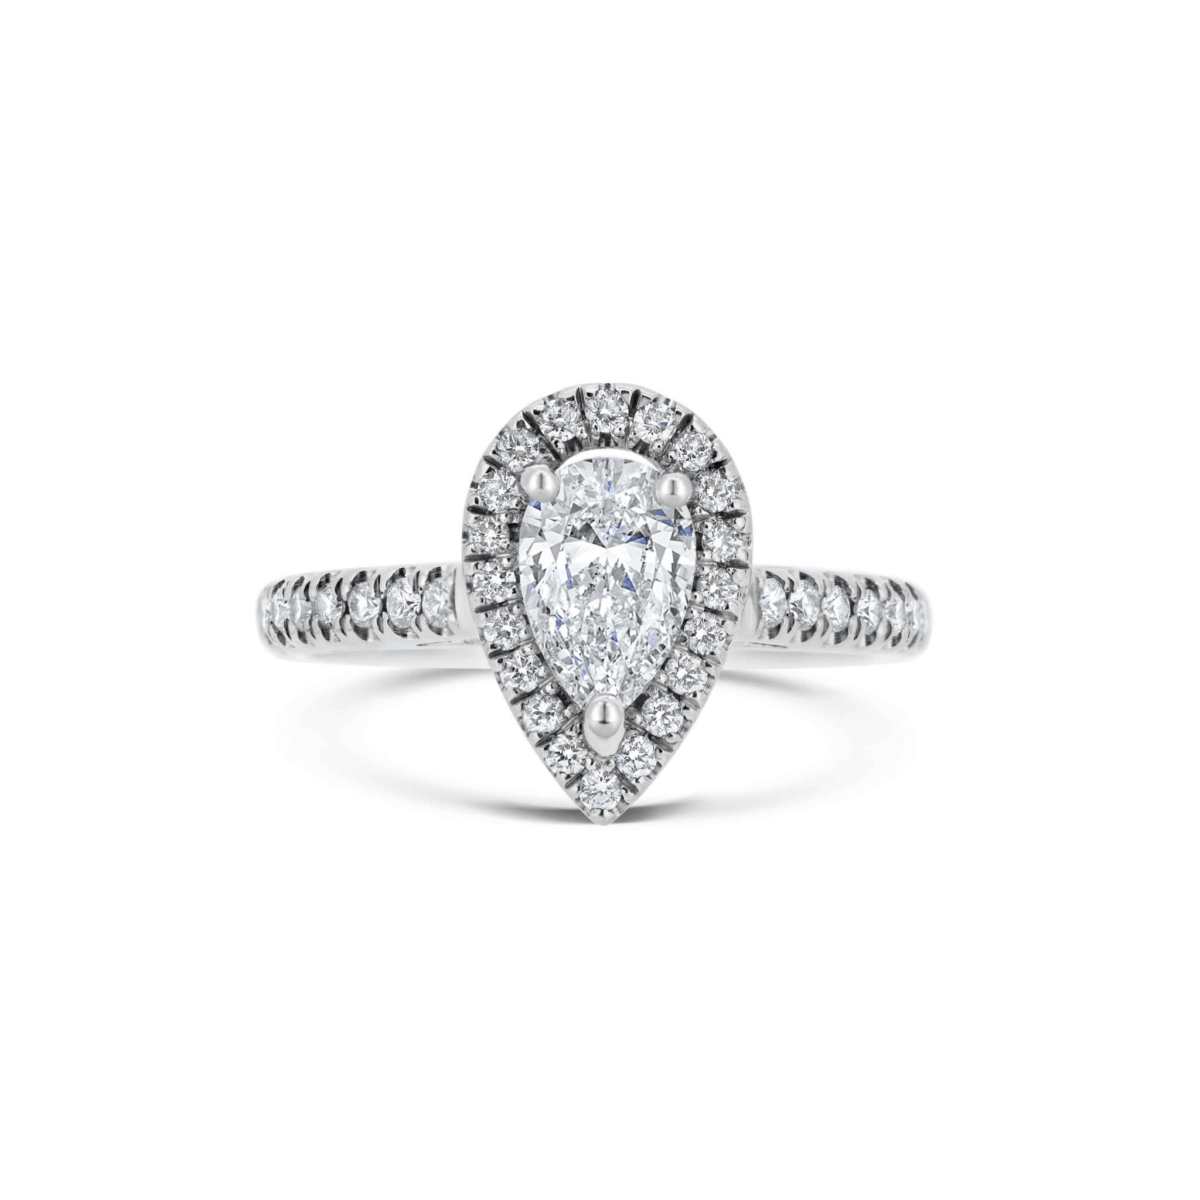 Tanya Pear Diamond Halo Microset Engagement Ring Front View